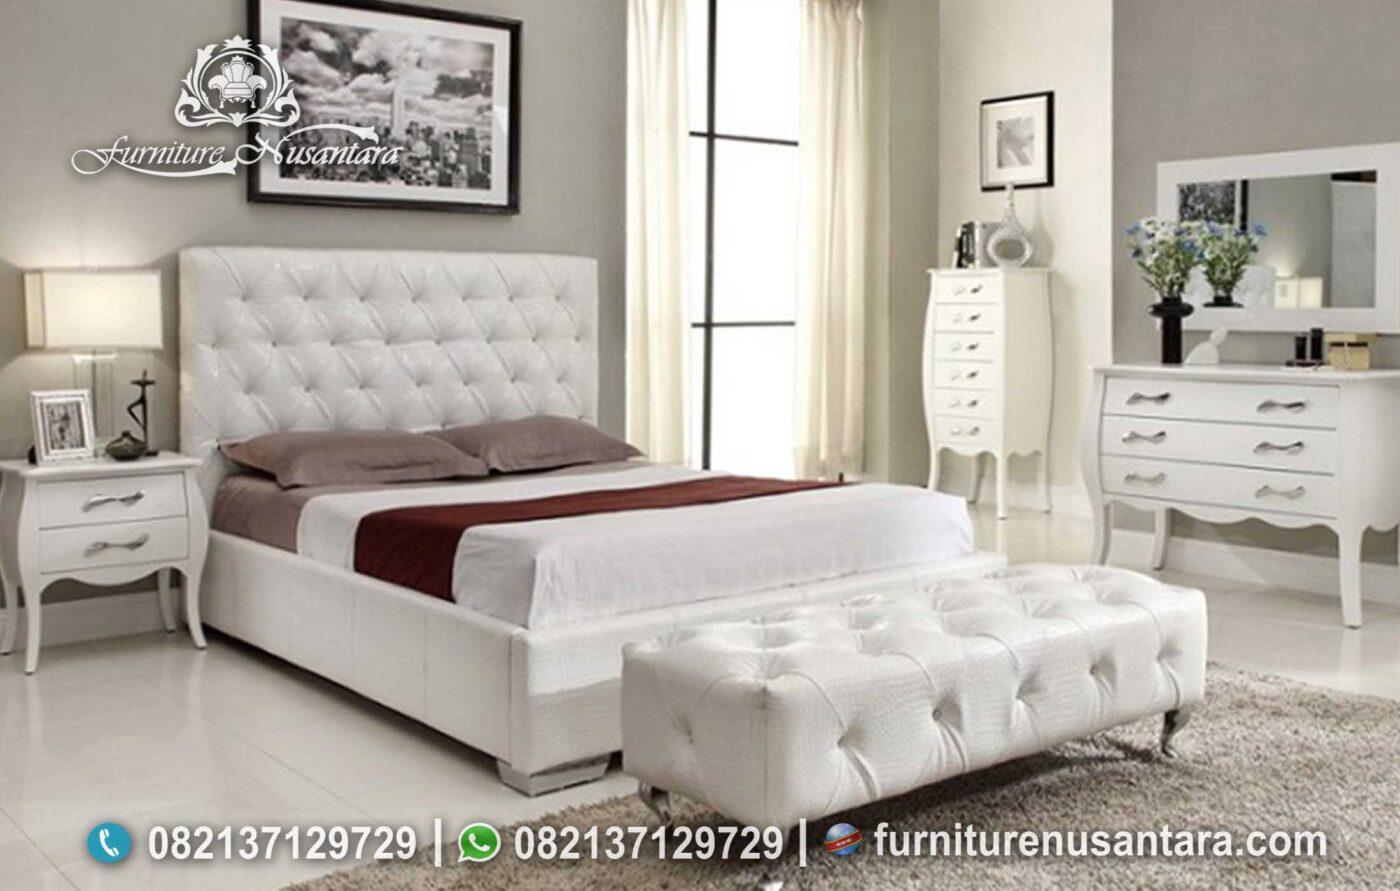 Desain Tempat Tidur Minimalis Italian Leather KS-225, Furniture Nusantara